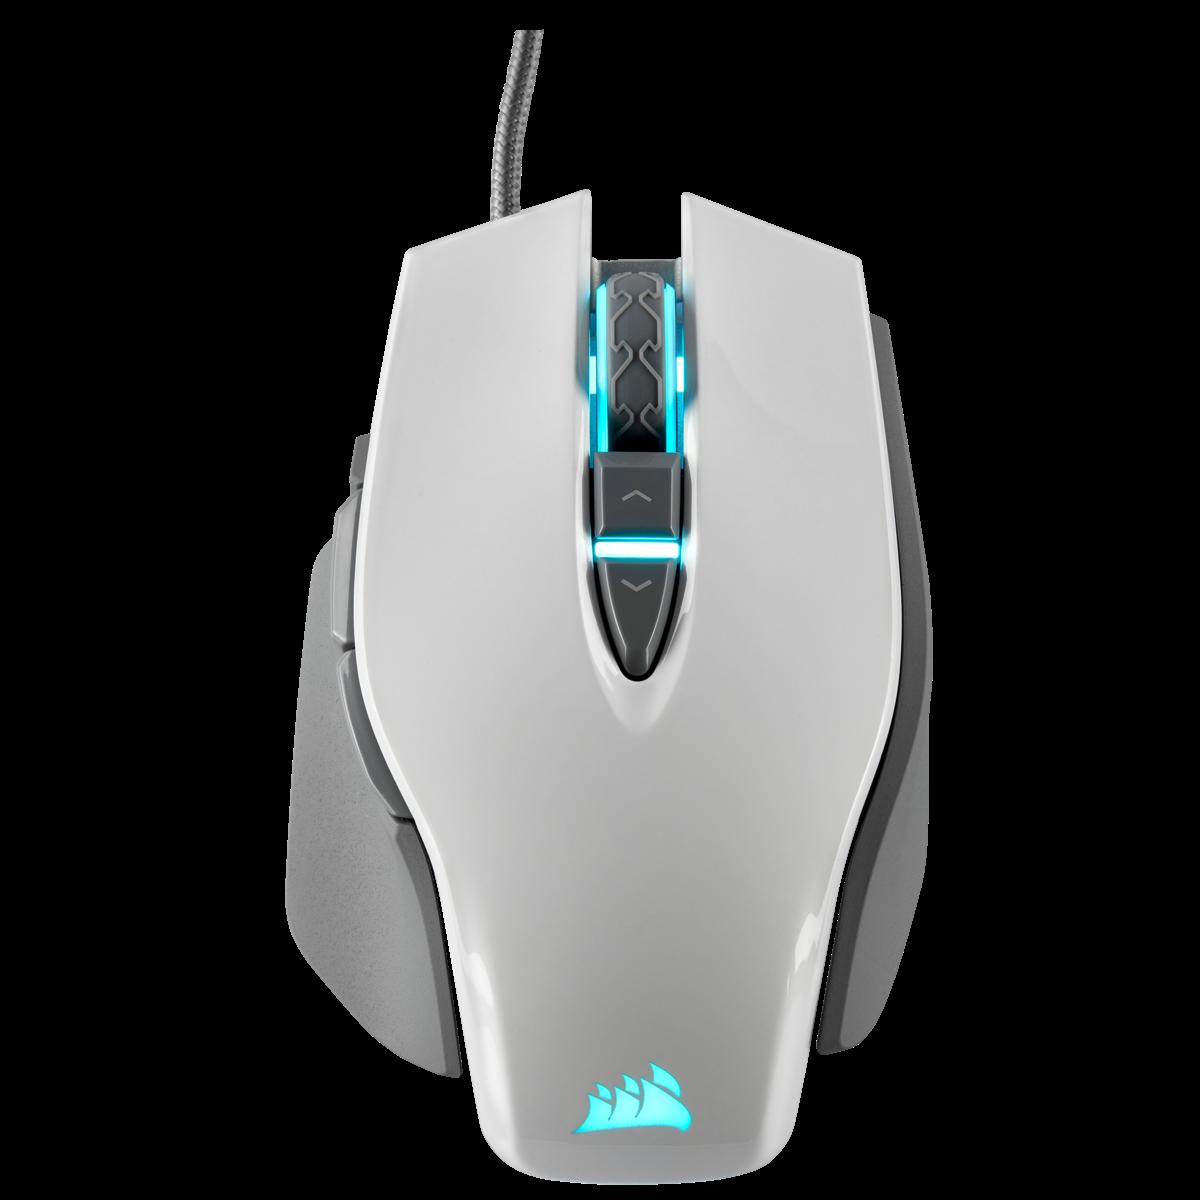 Mouse Gamer Corsair M65 Rgb Elite Ajustable Fps, Blanco - Clones y  Periféricos